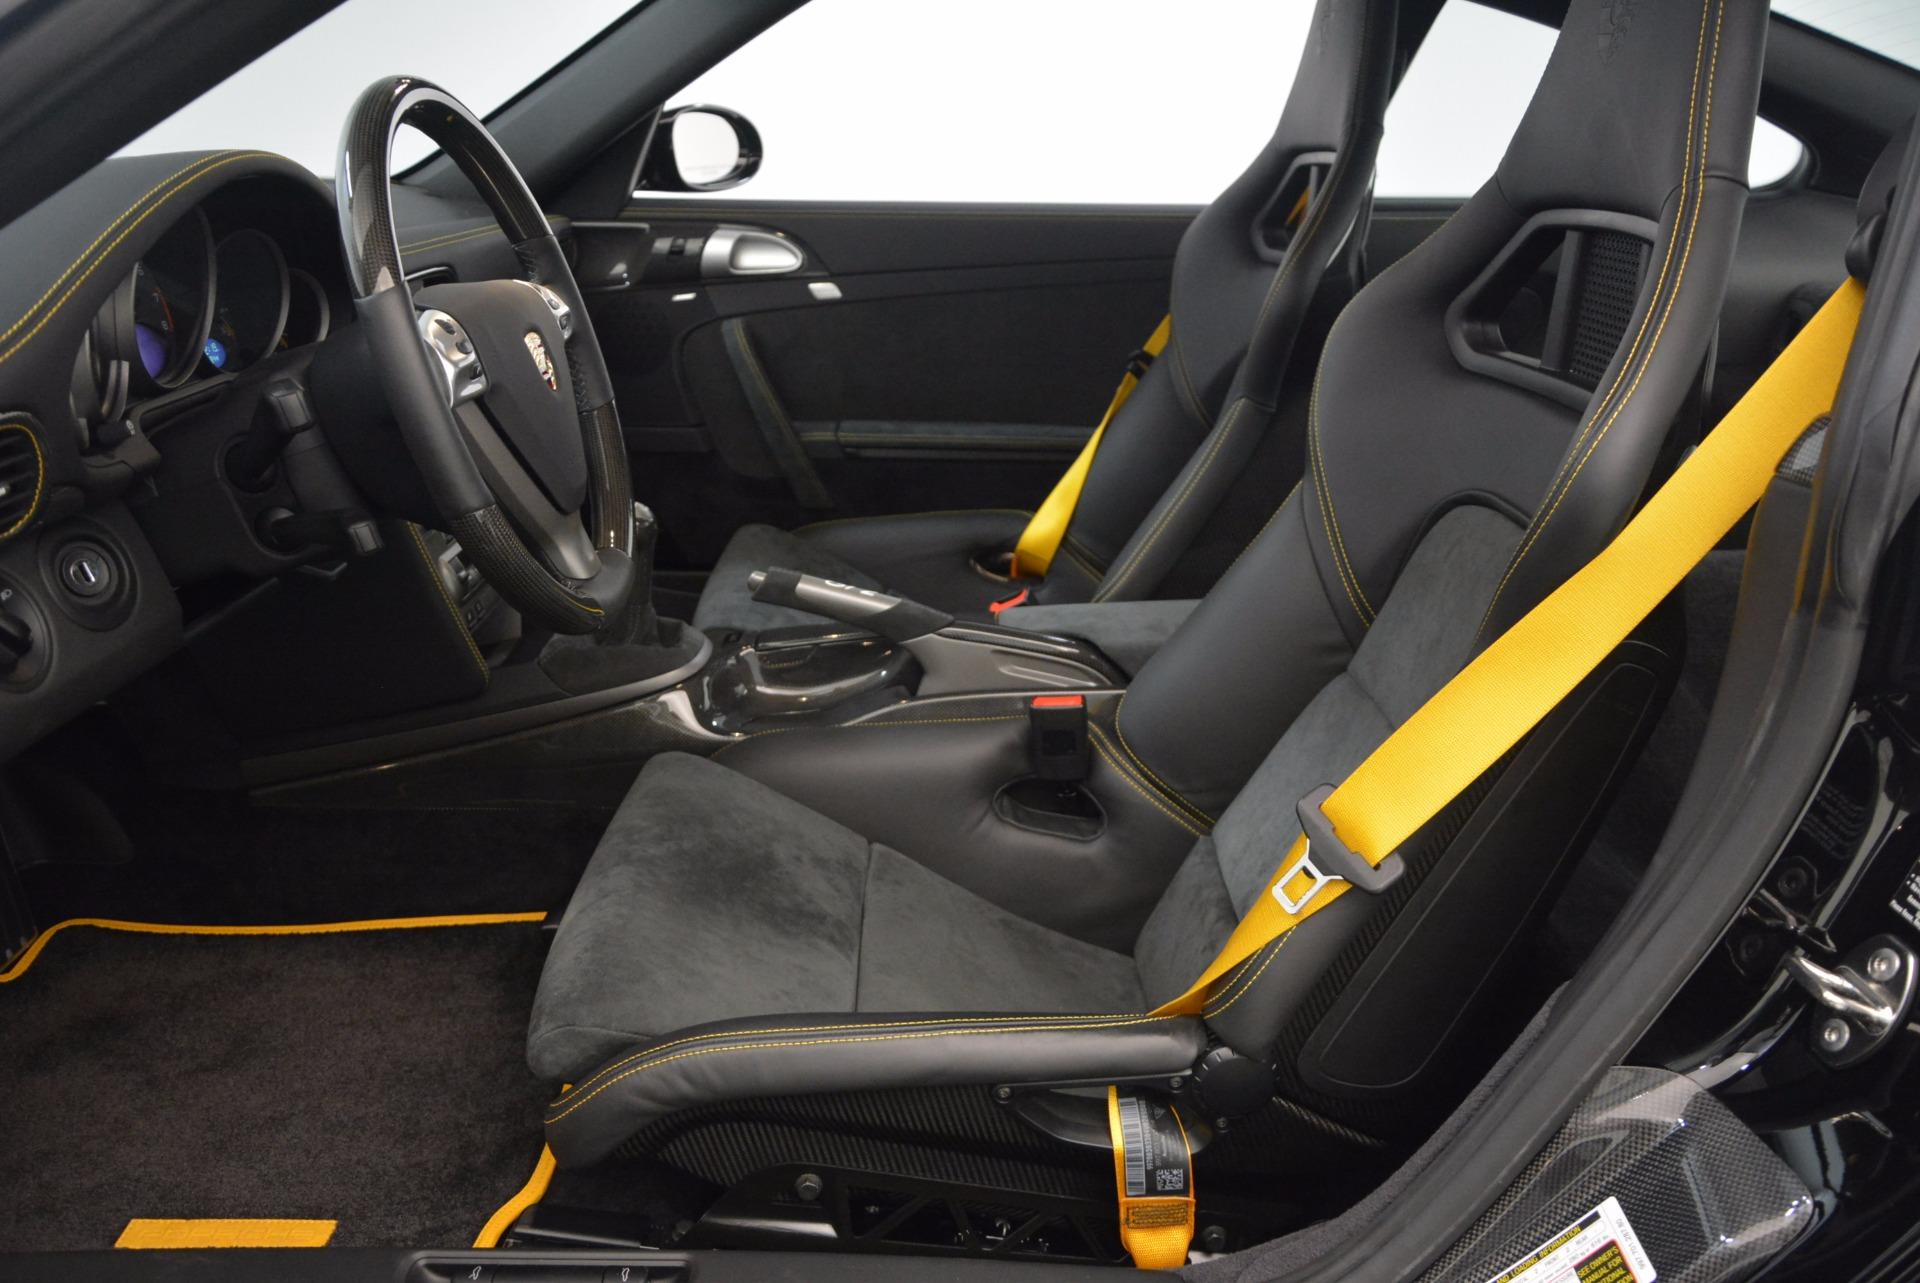 Used 2008 Porsche 911 GT2 For Sale In Greenwich, CT. Alfa Romeo of Greenwich, 7239 1400_p14